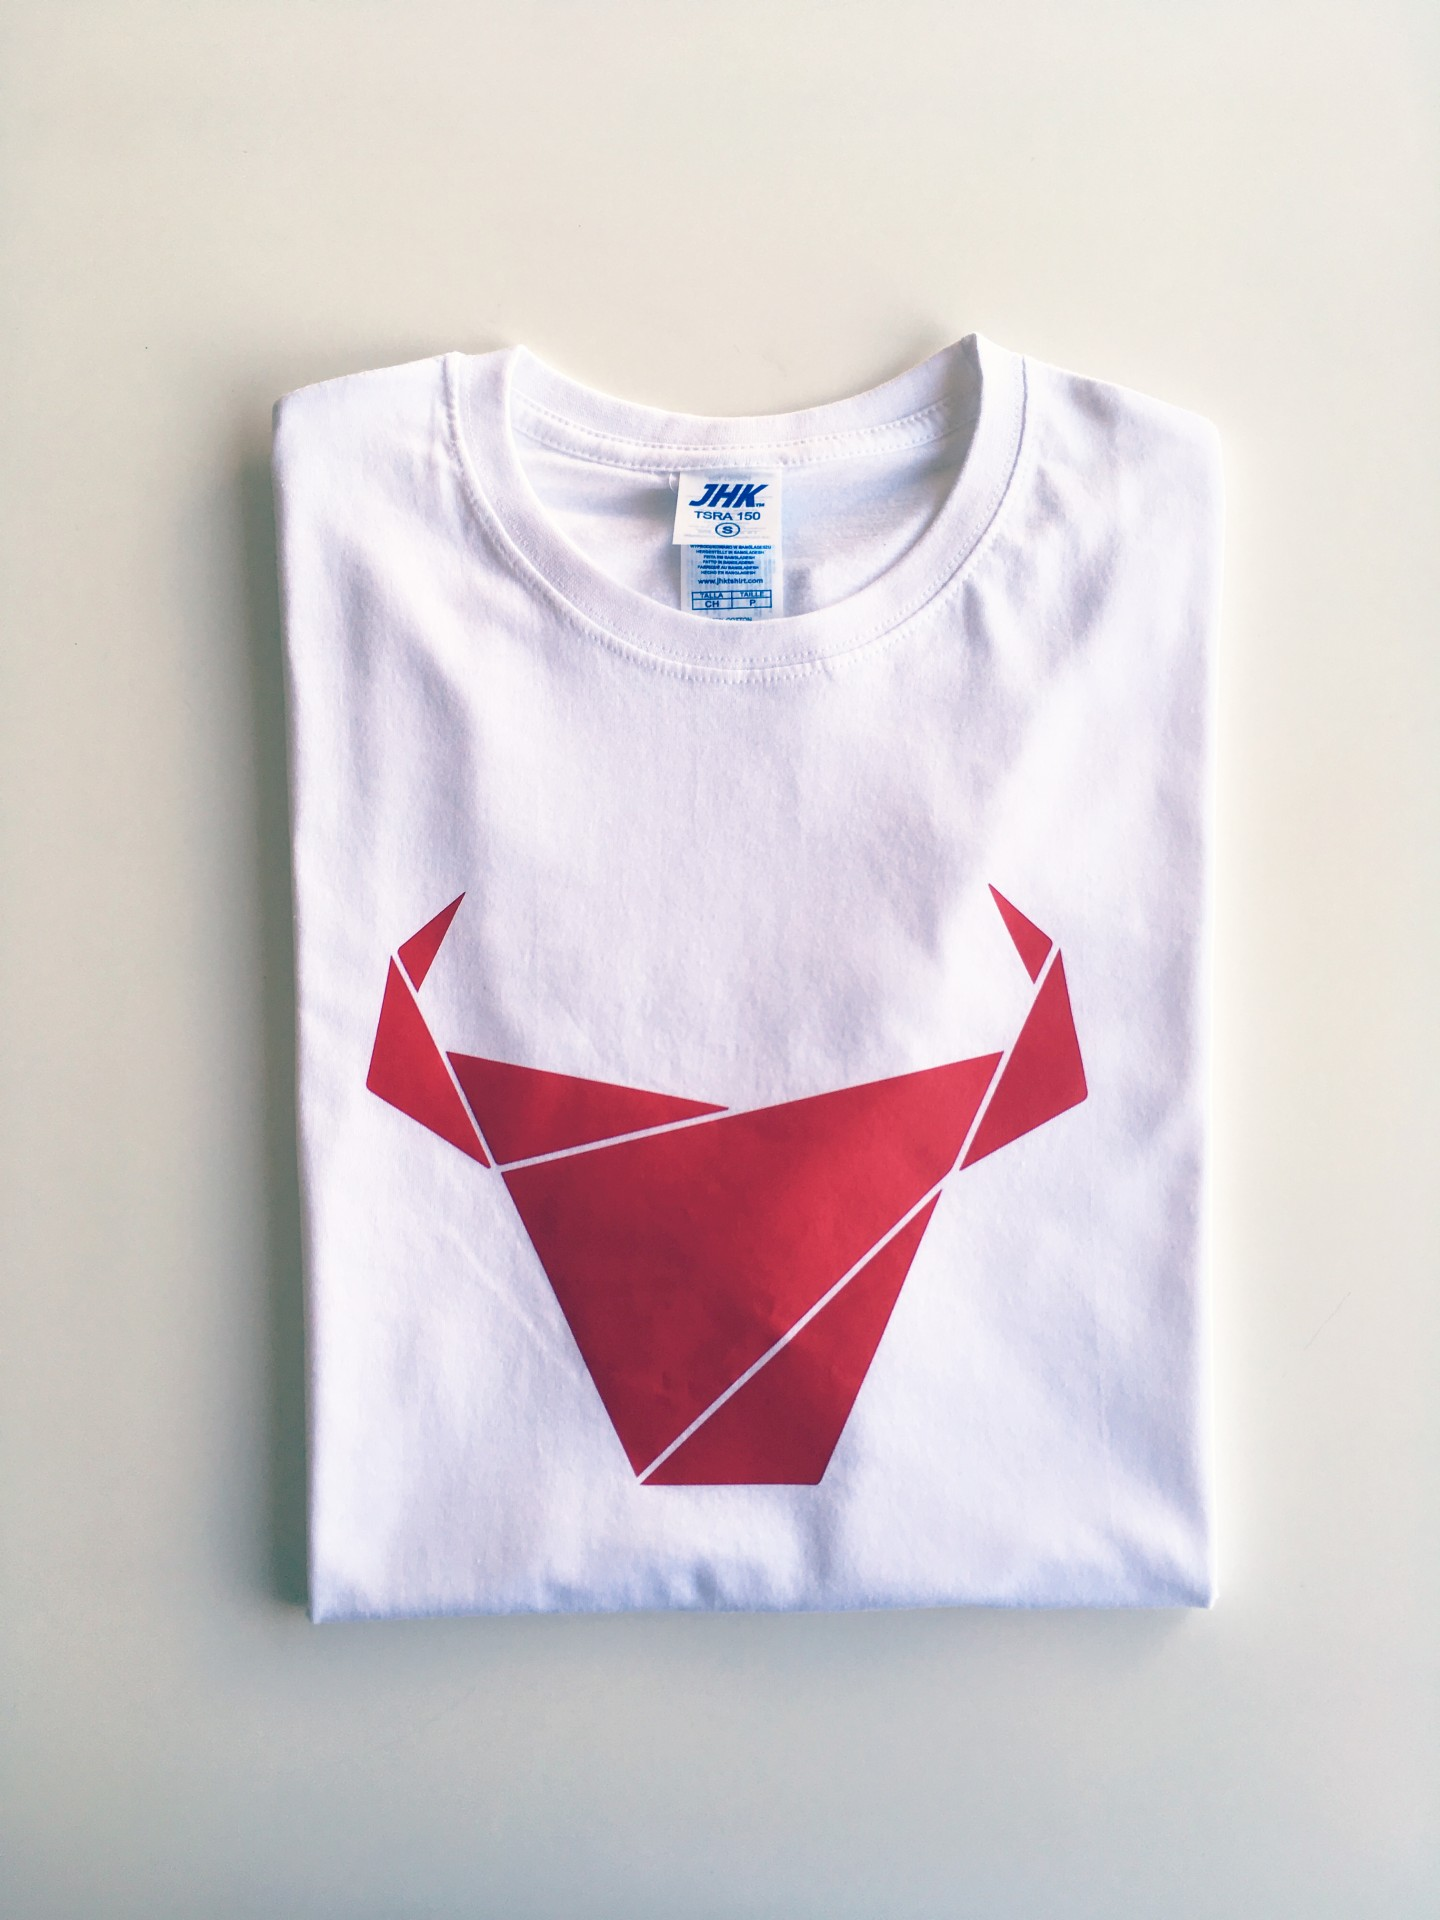 ESGOTADO T-Shirt Toiro / Mulher / Branco